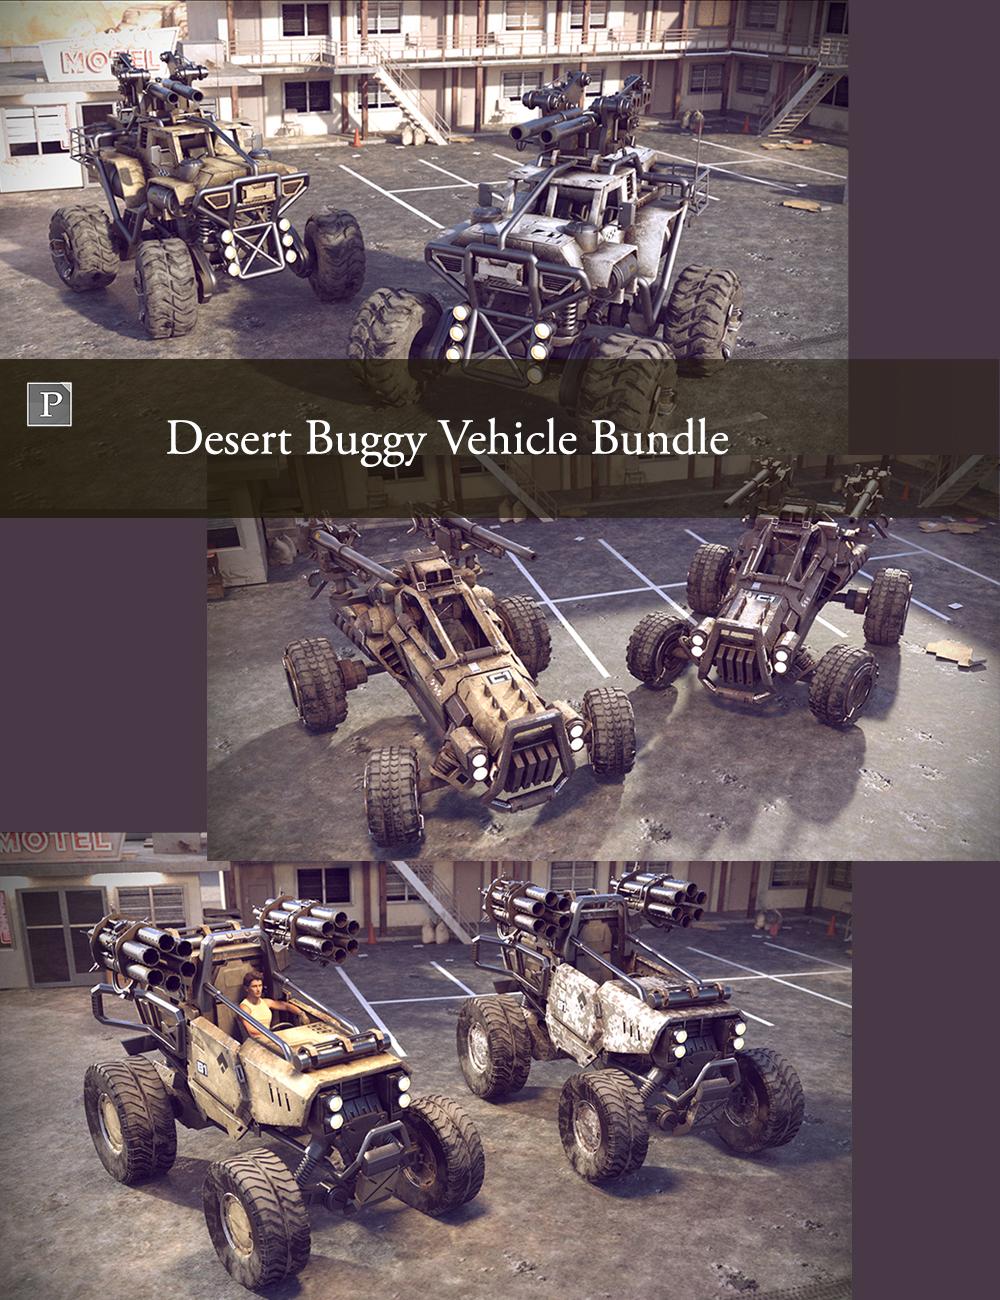 Desert Buggy Vehicle Bundle by: Polish, 3D Models by Daz 3D